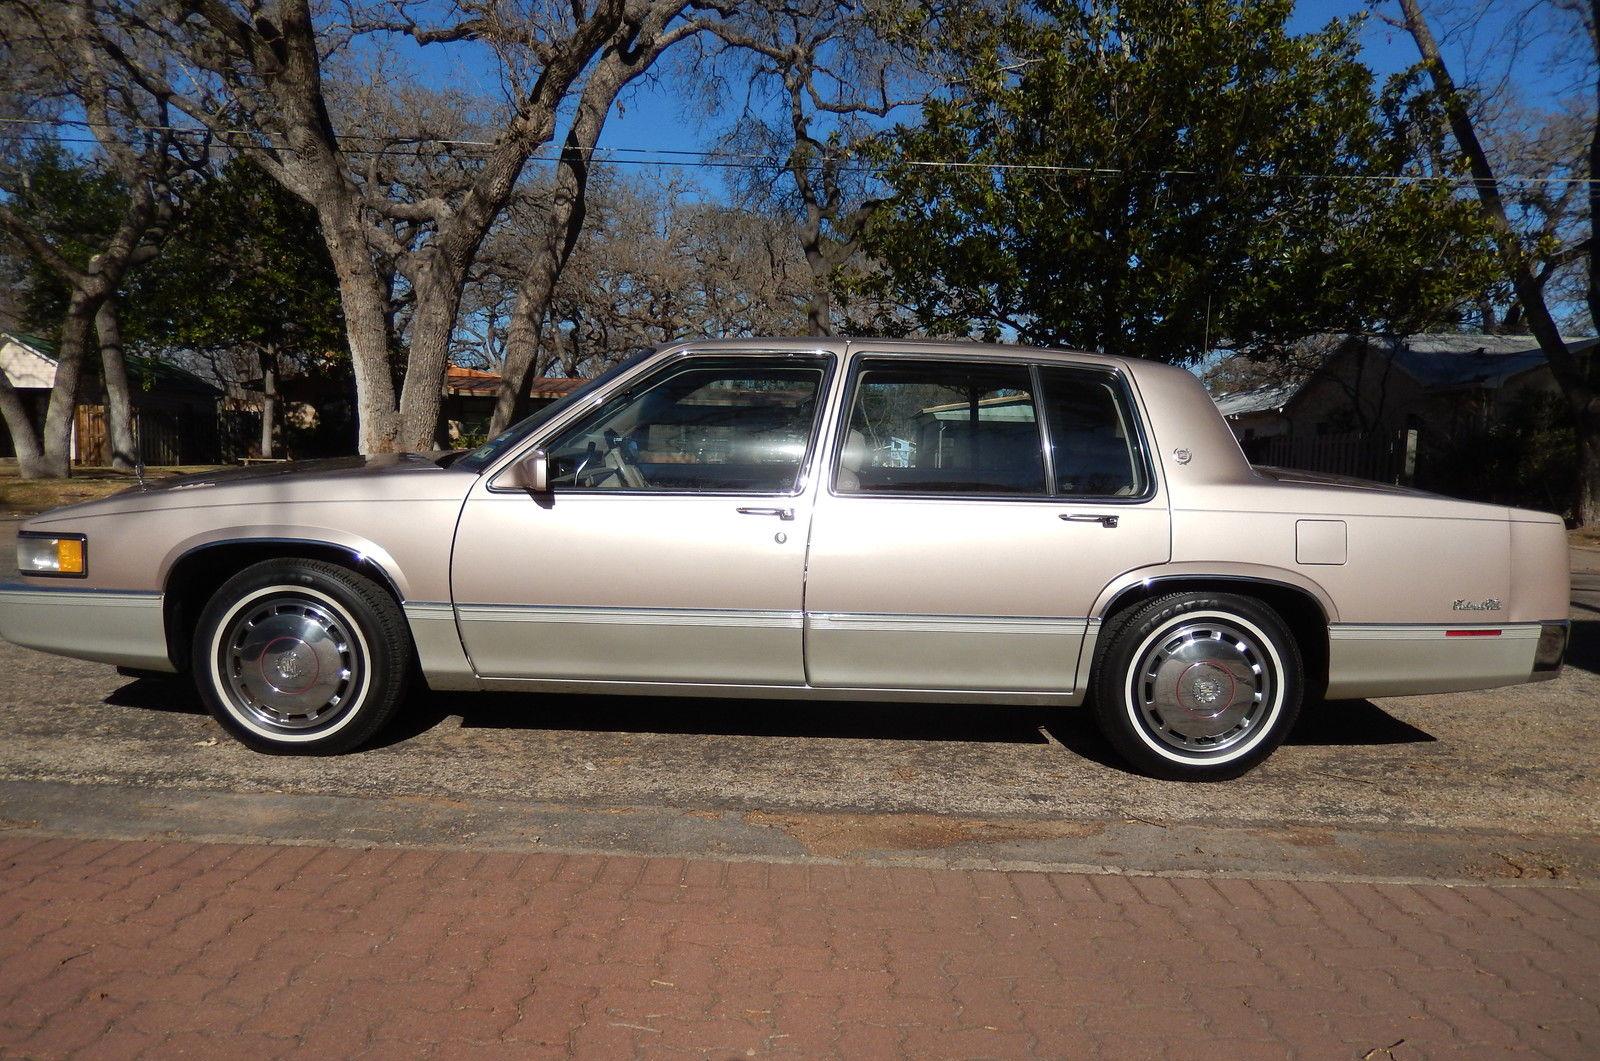 File:1989 Cadillac Sedan DeVille (01).jpg - Wikimedia Commons